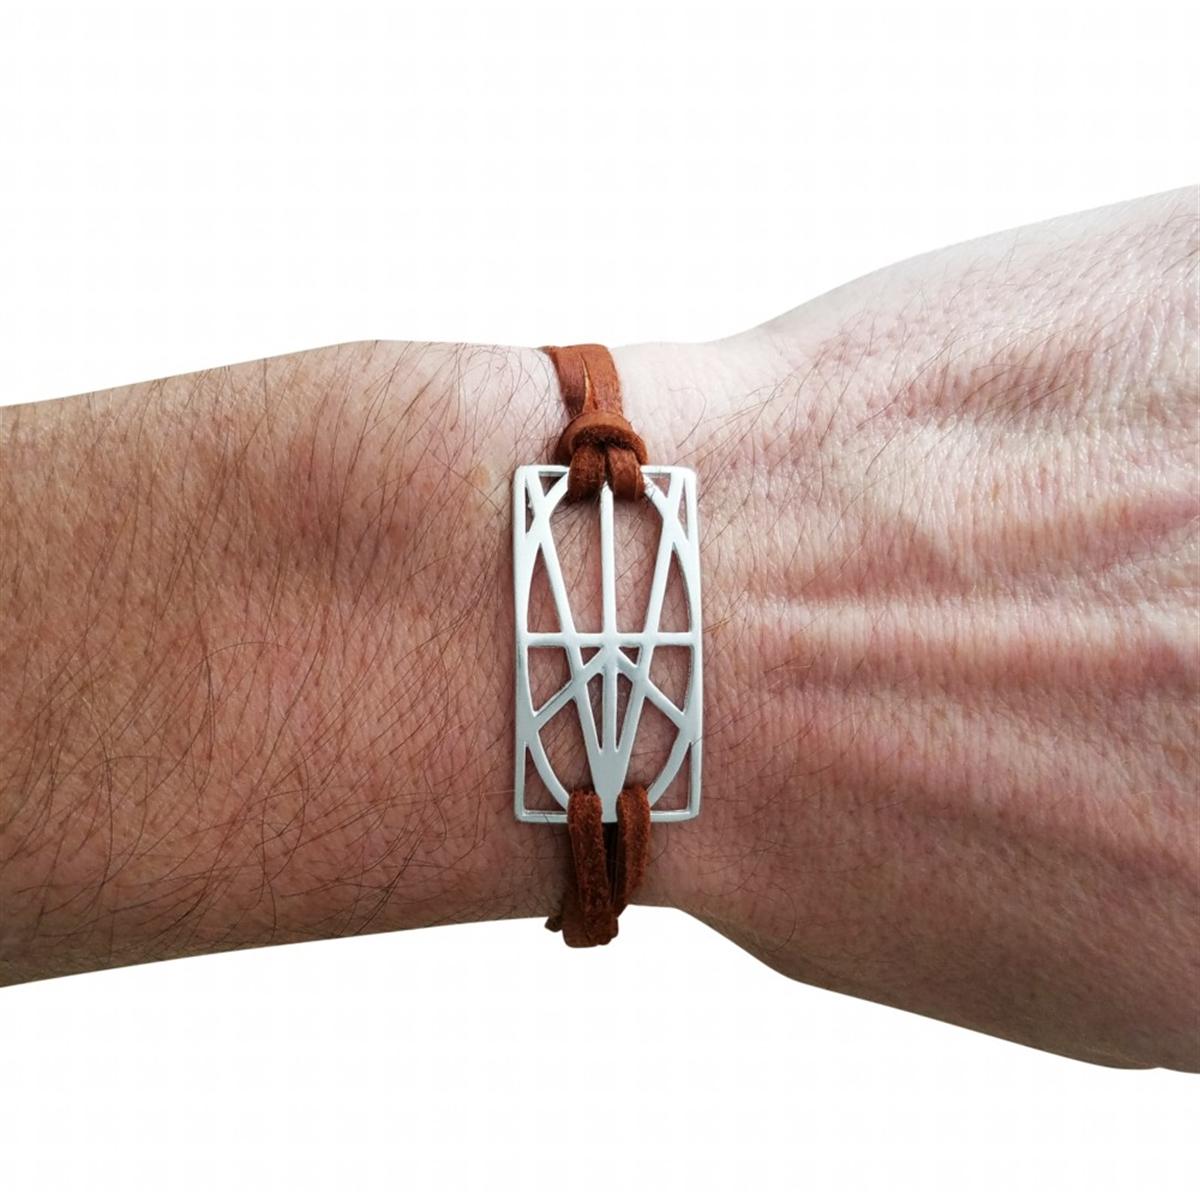 Picture of Men's Sterling Silver Wrap & Tuck Bracelet - Brown